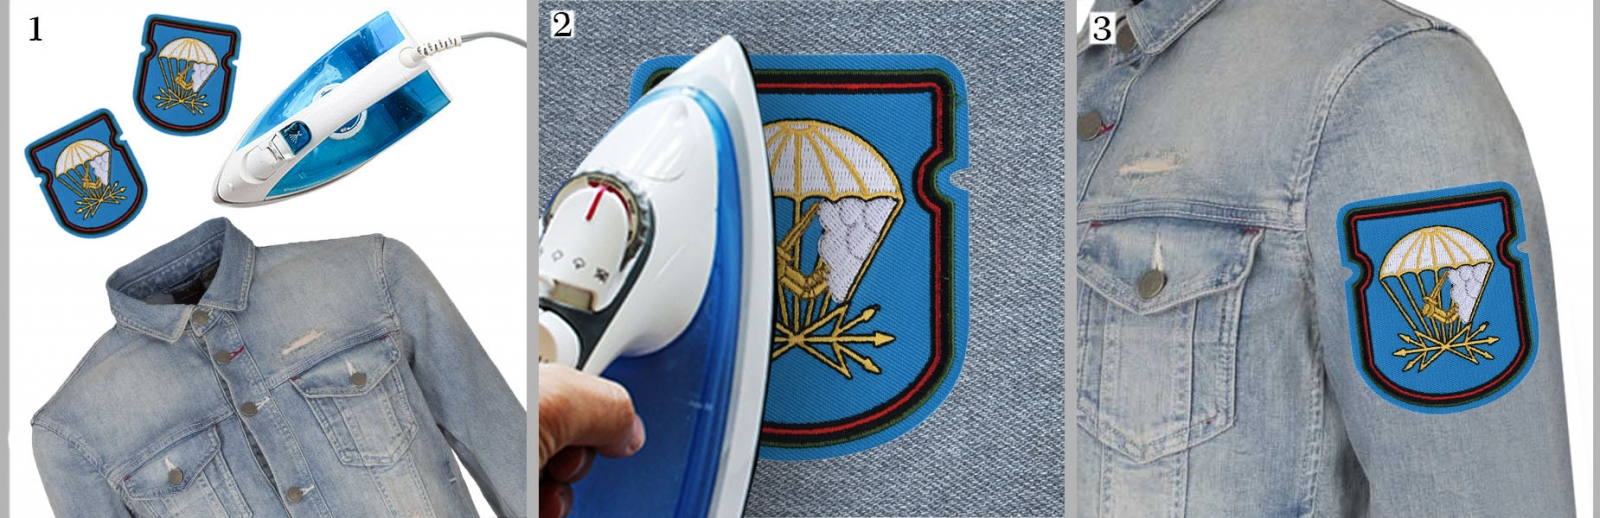 "Нарукавный знак ""674 батальон связи 98 ВДД ВДВ"" на куртке"